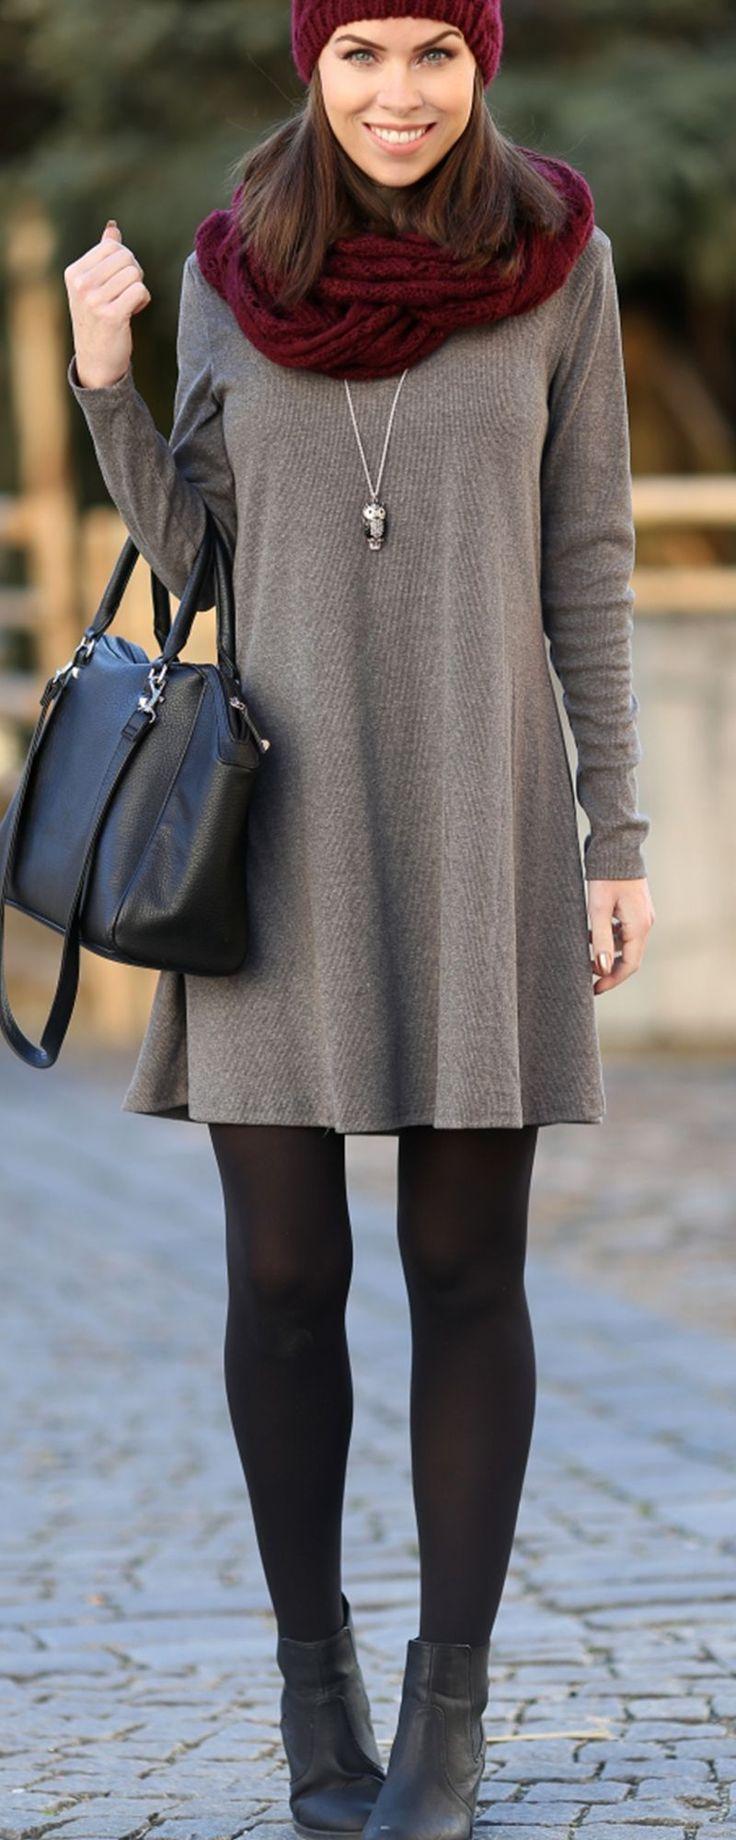 Ivy Tech Community College best 15 Winter fashion ideas